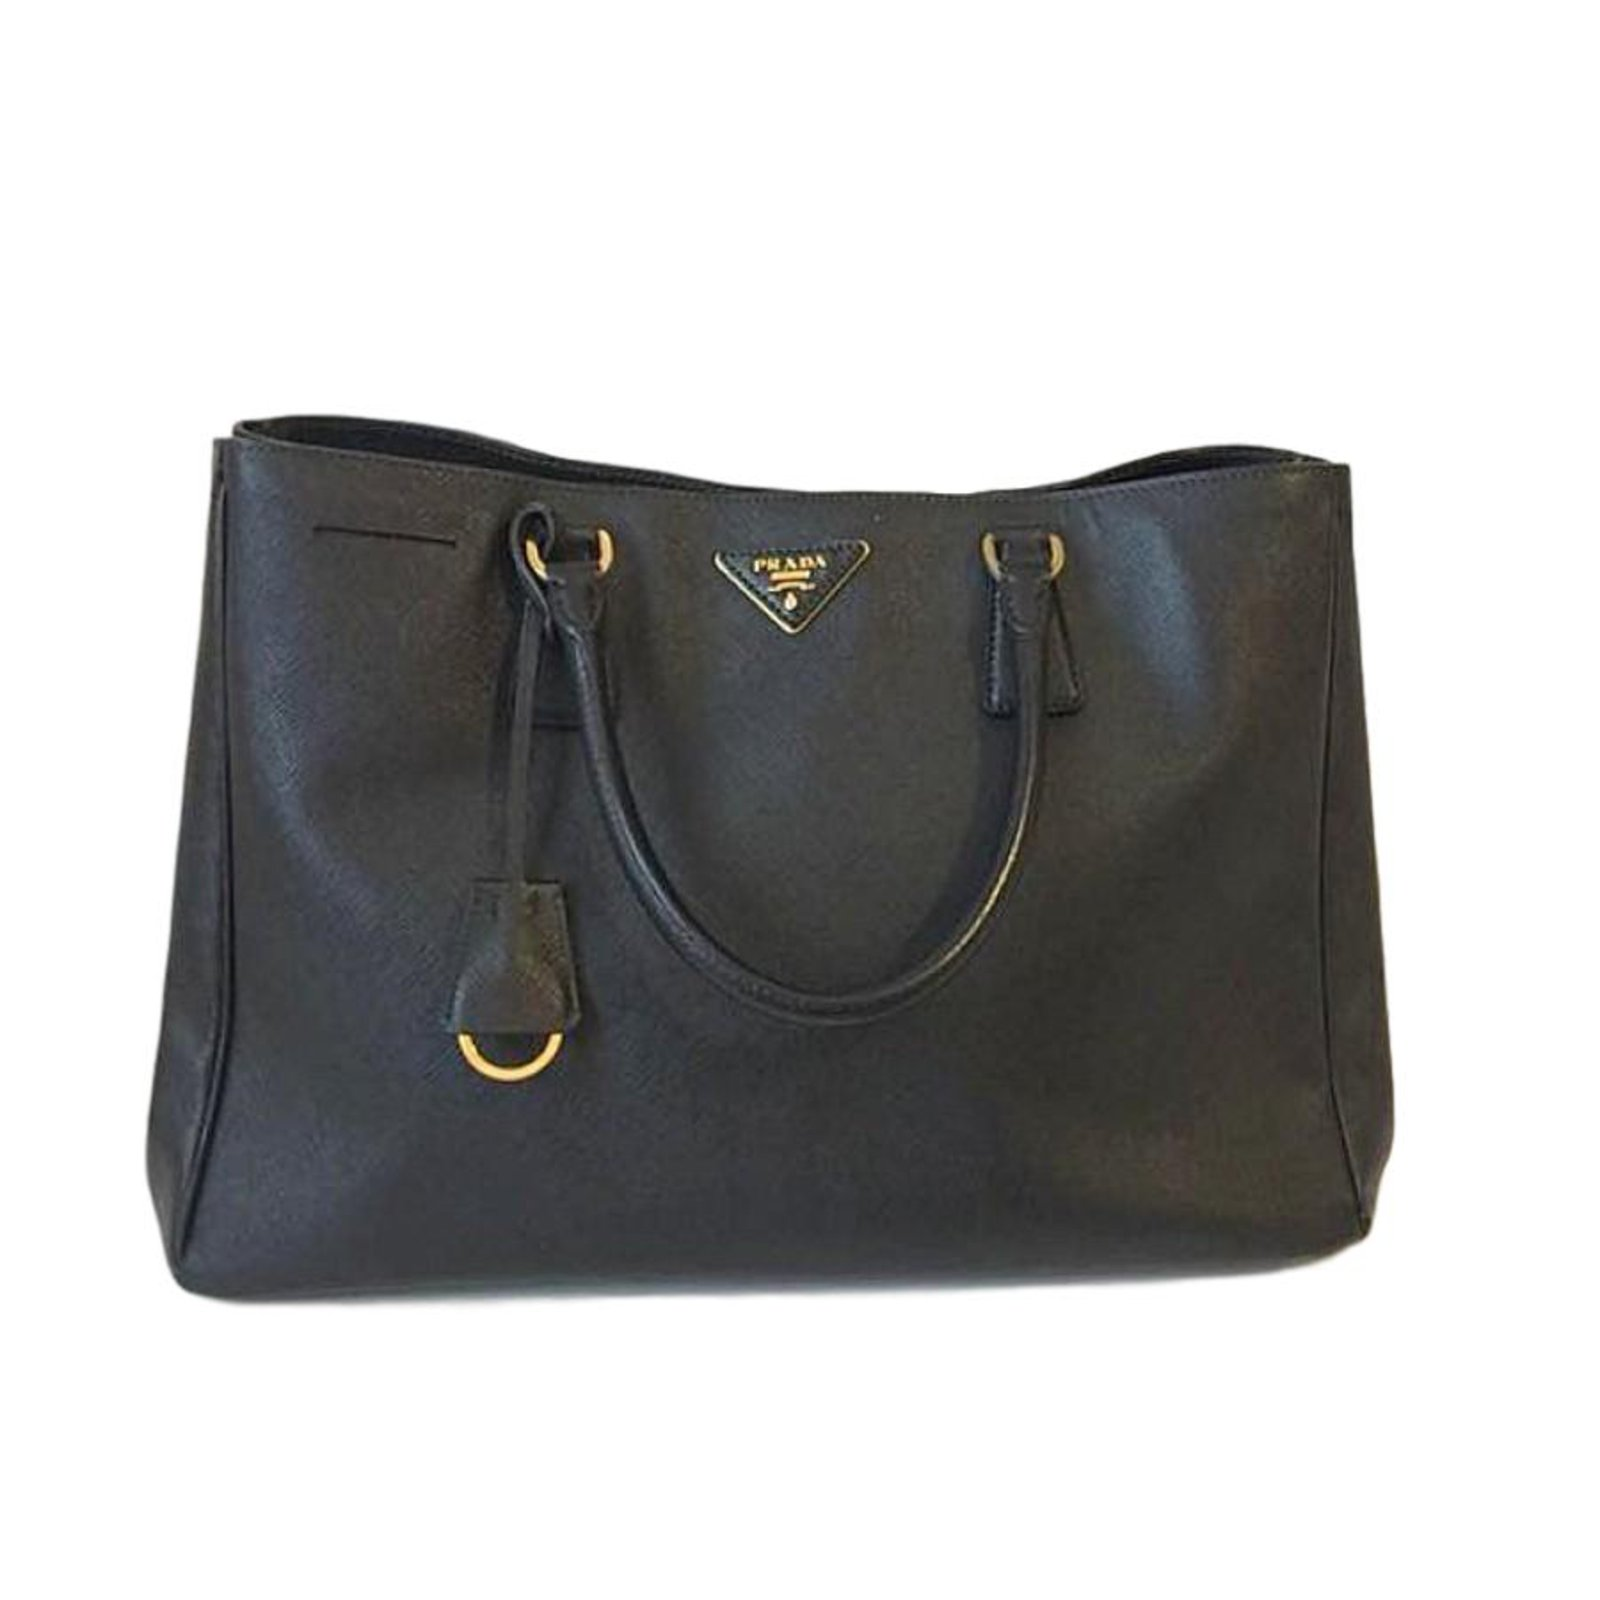 c73229679567 low price prada lux large double zip saffiano leather tote black 65fc7  aedc1  wholesale prada saffiano handbags leather black ref.67344 37d8f 510b8